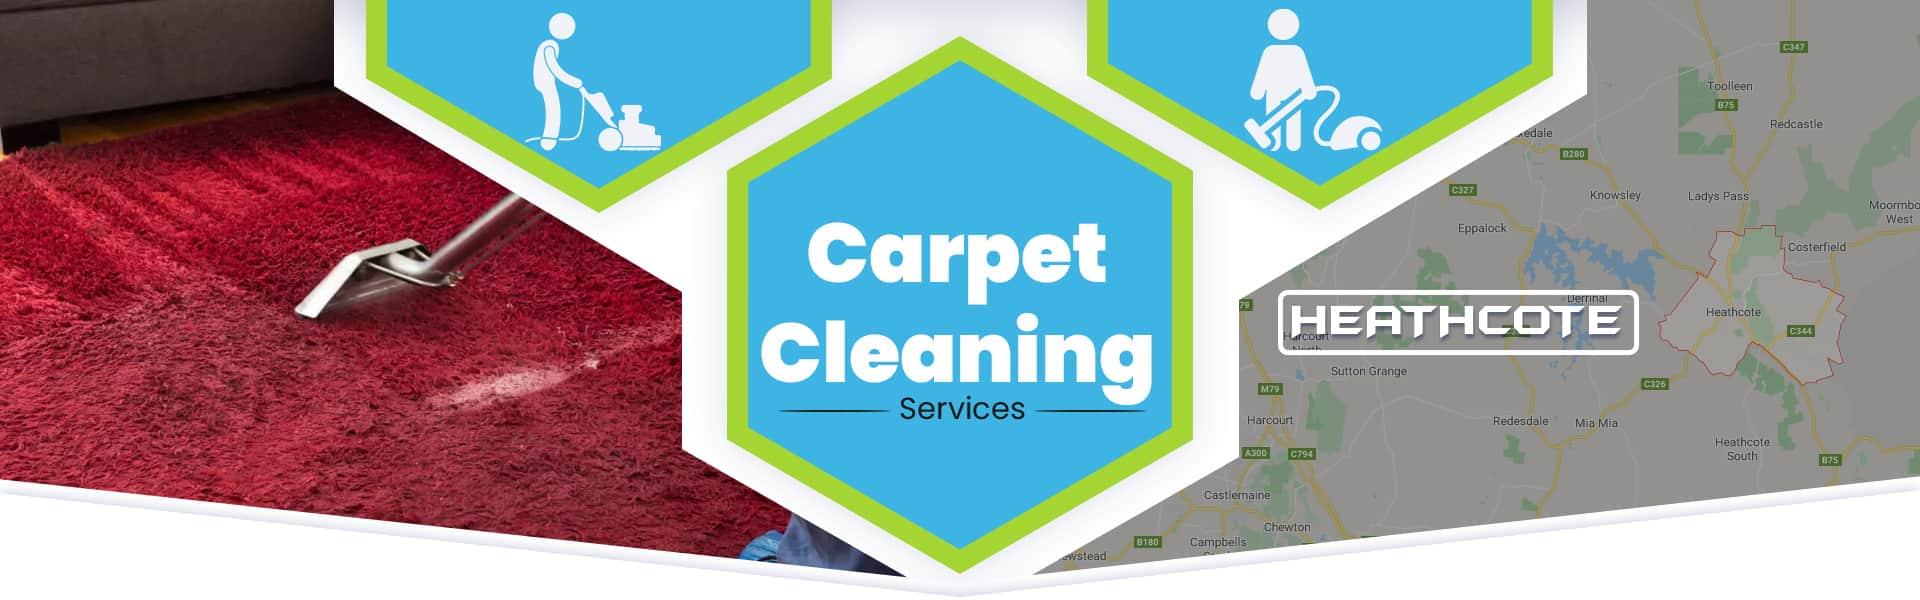 Carpet Cleaning Heathcote